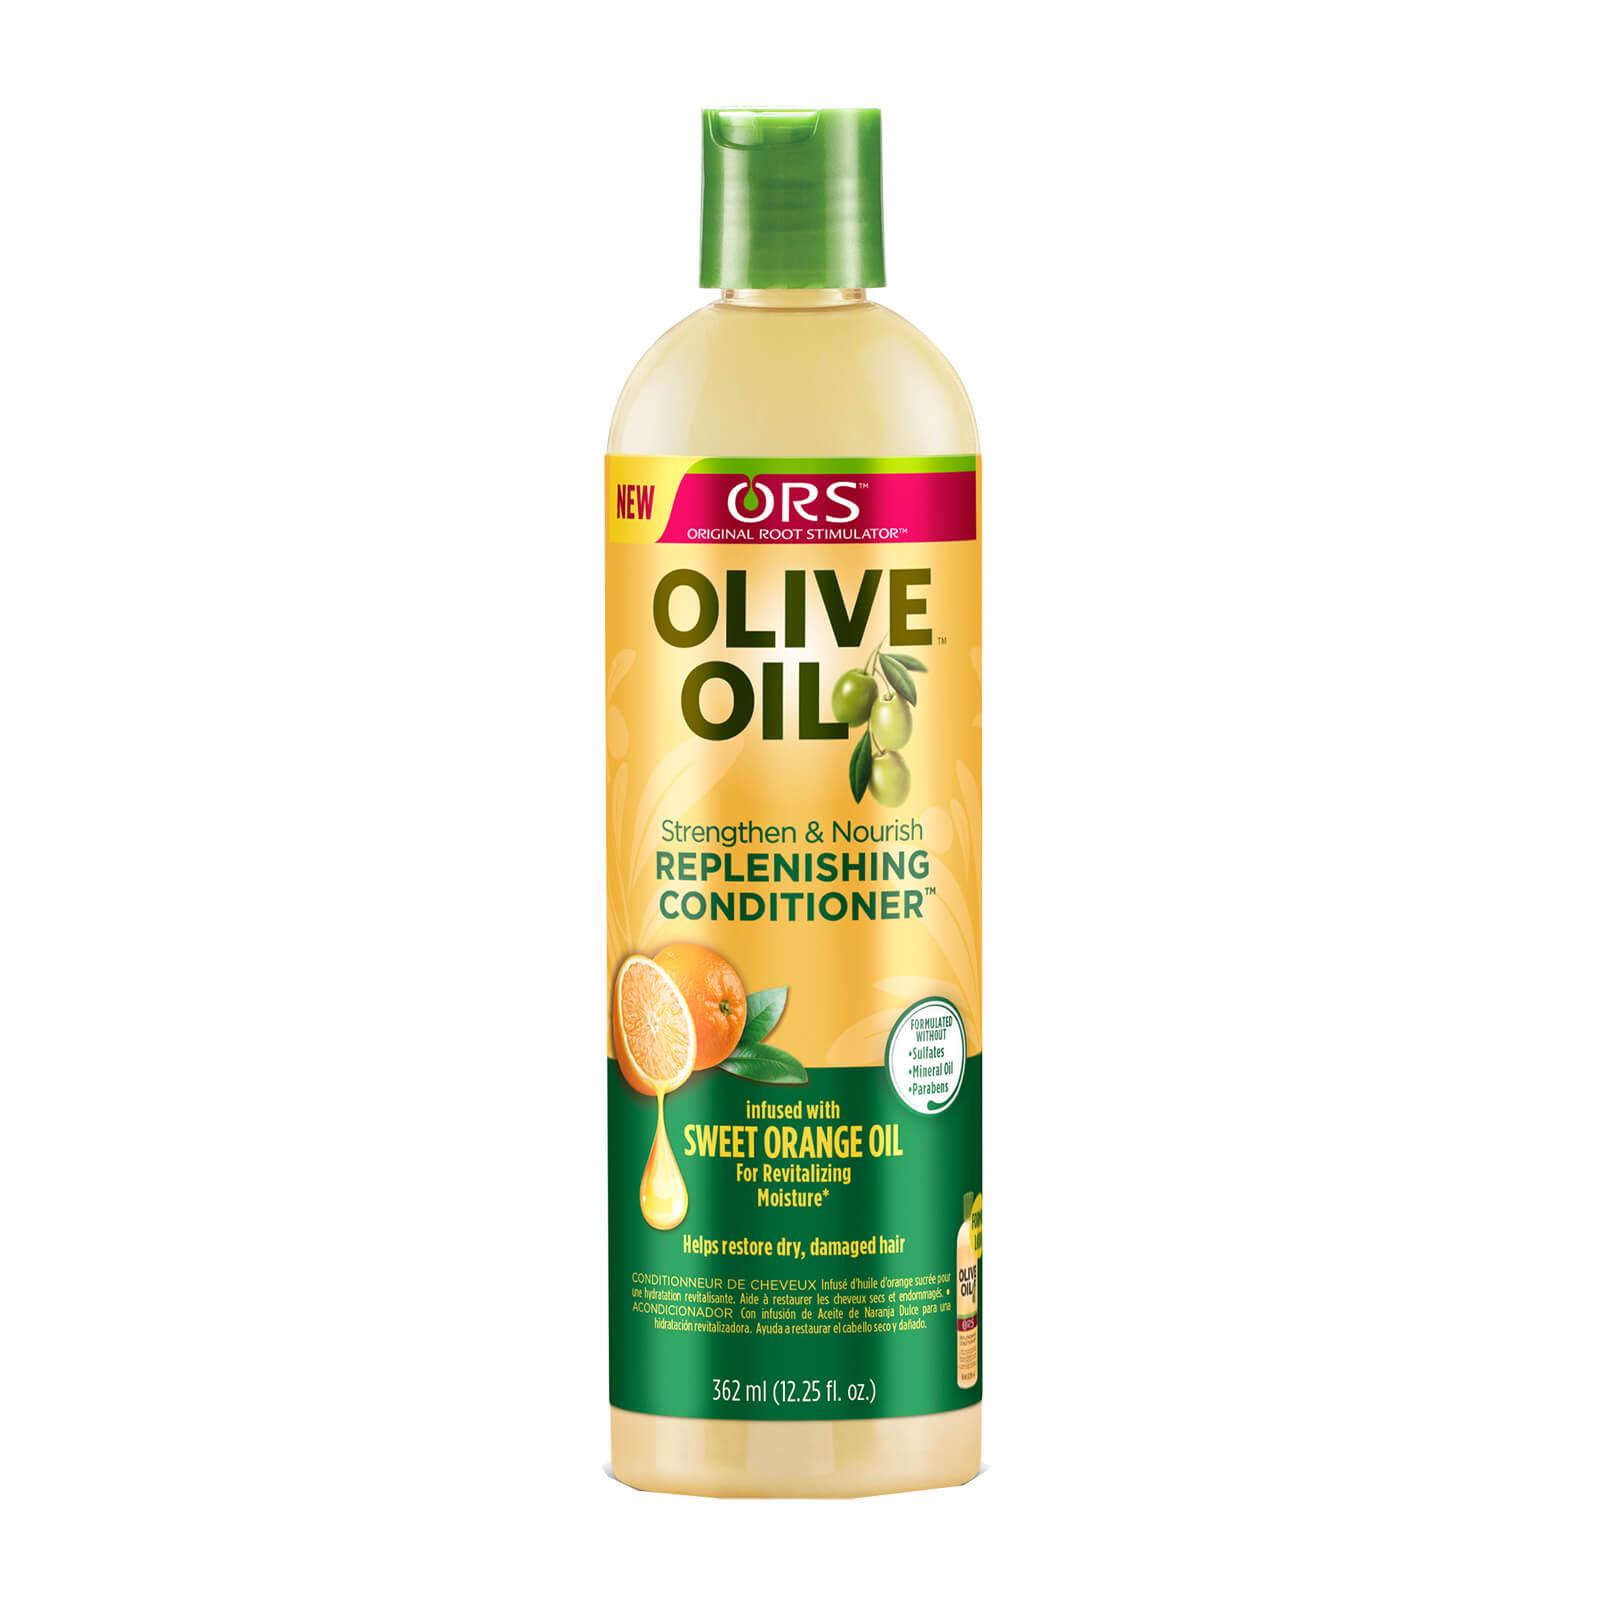 Купить ORS Olive Oil Replenishing Conditioner 370ml